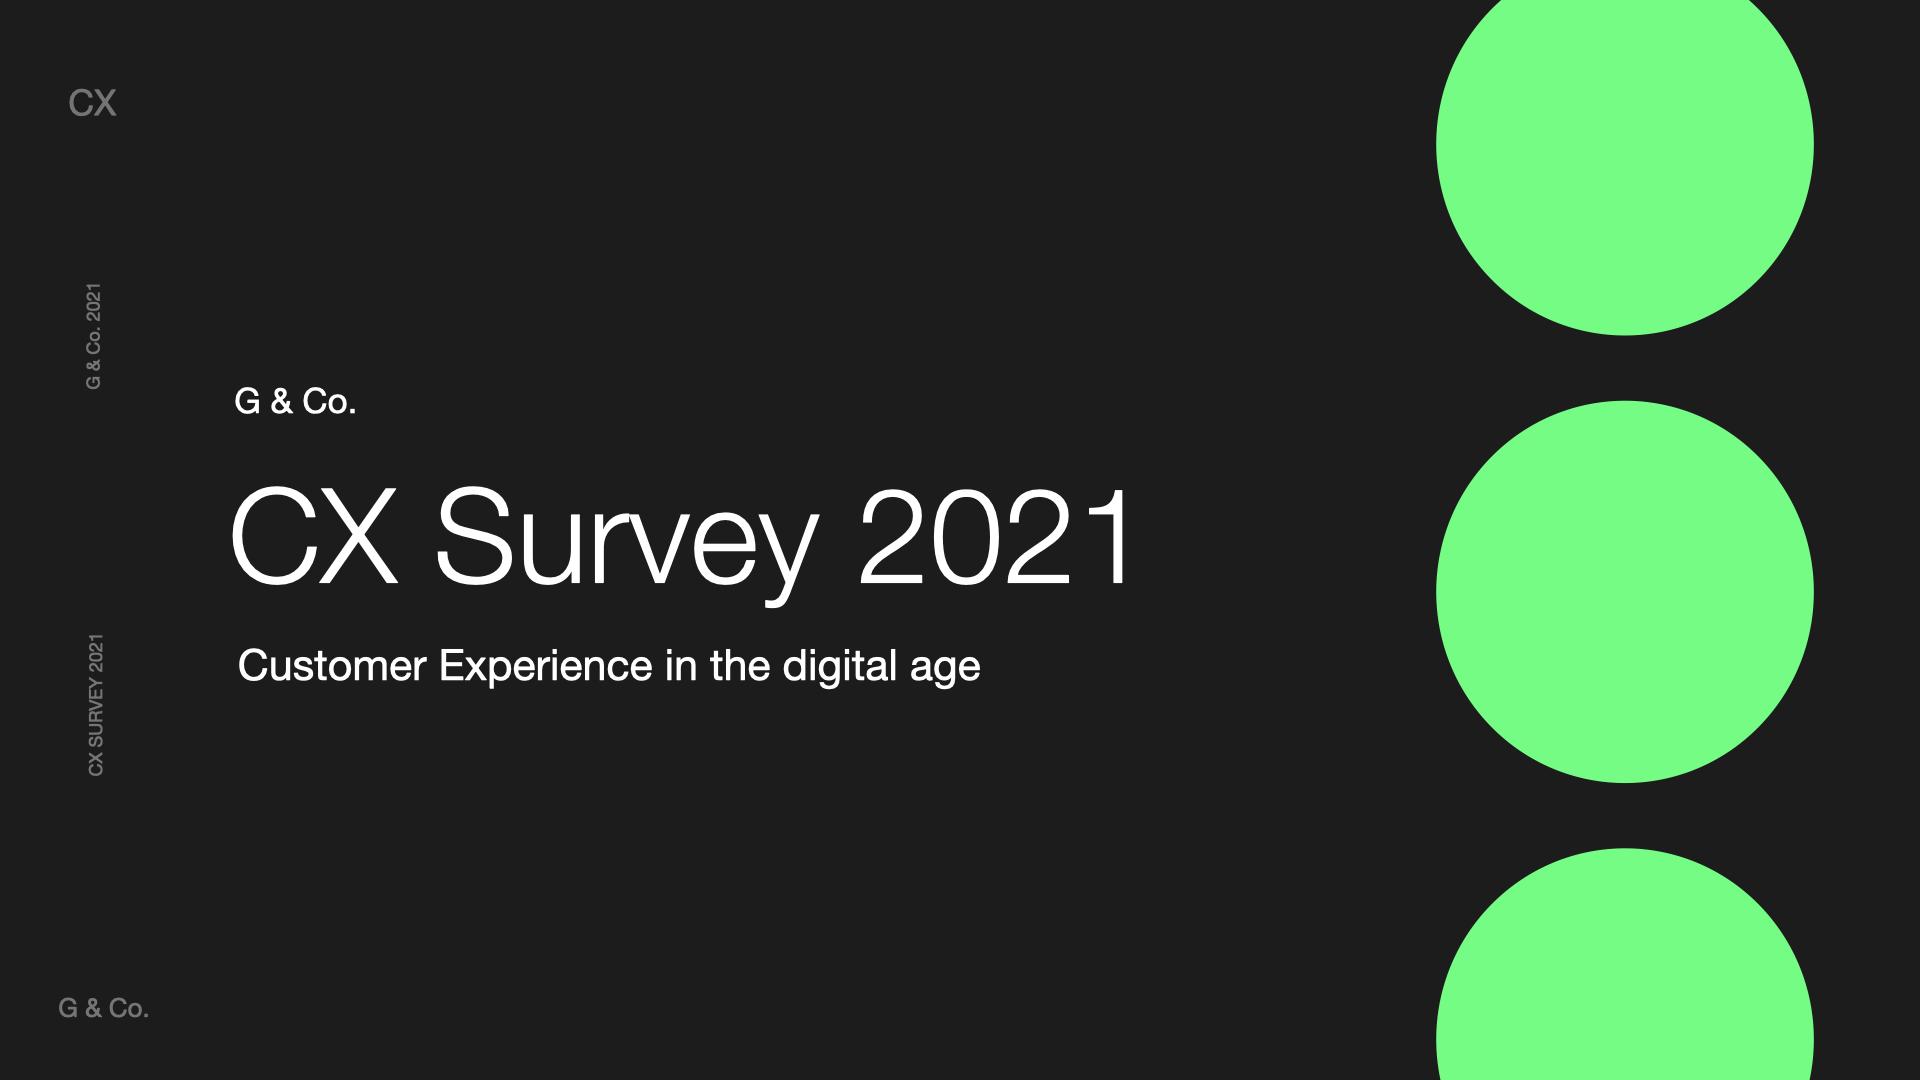 G & Co. Customer Experience CX Survey - CX Agency, Customer Experience Agency